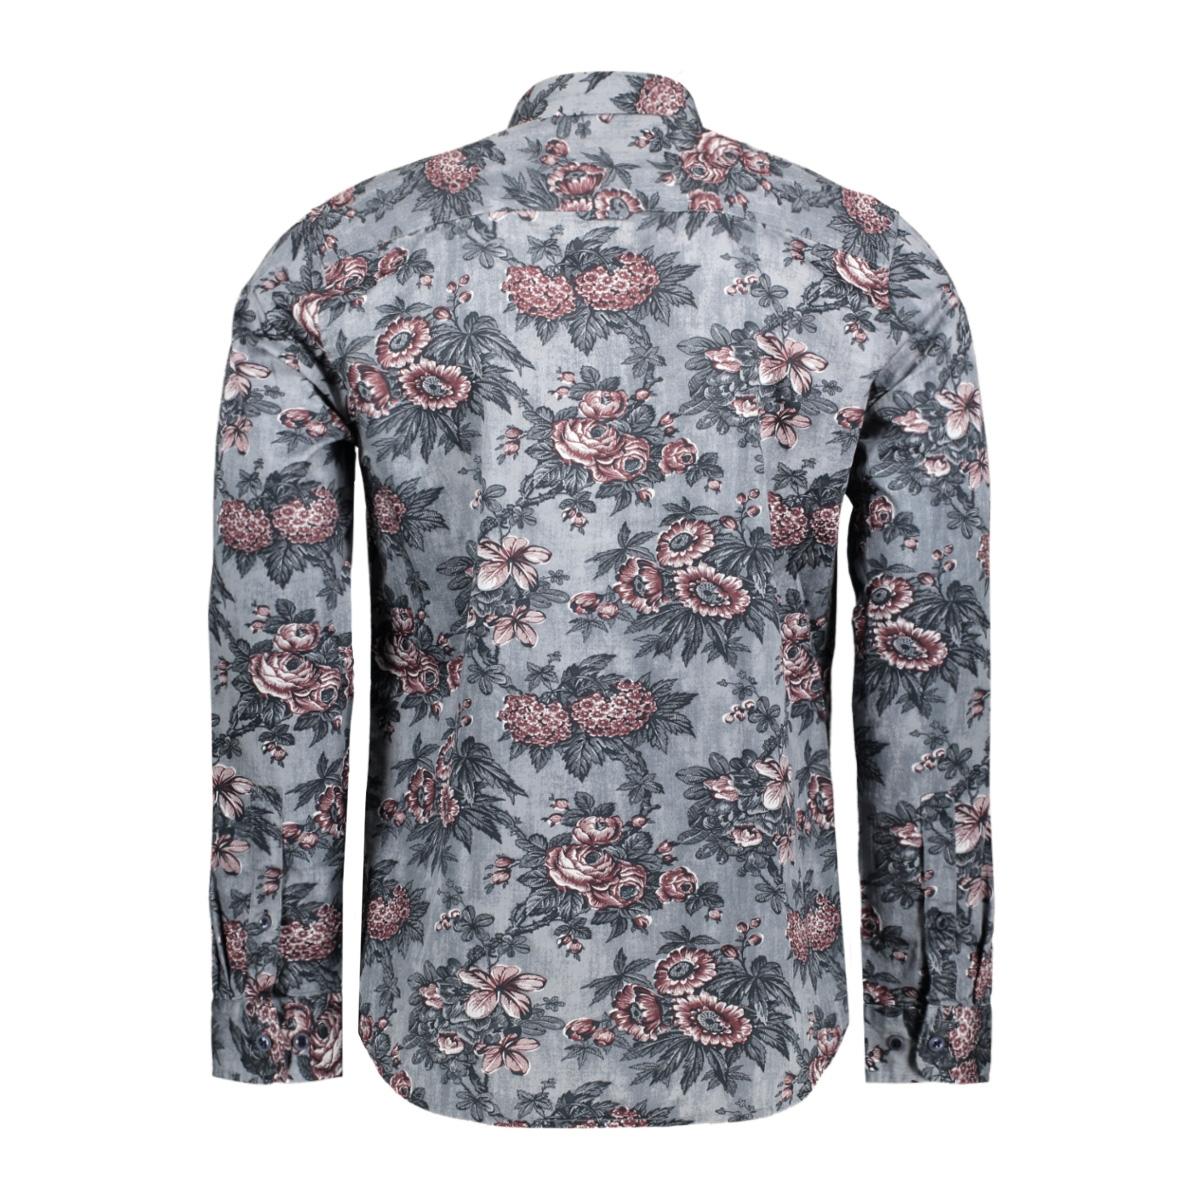 trostol 30202168 matinique overhemd 20201